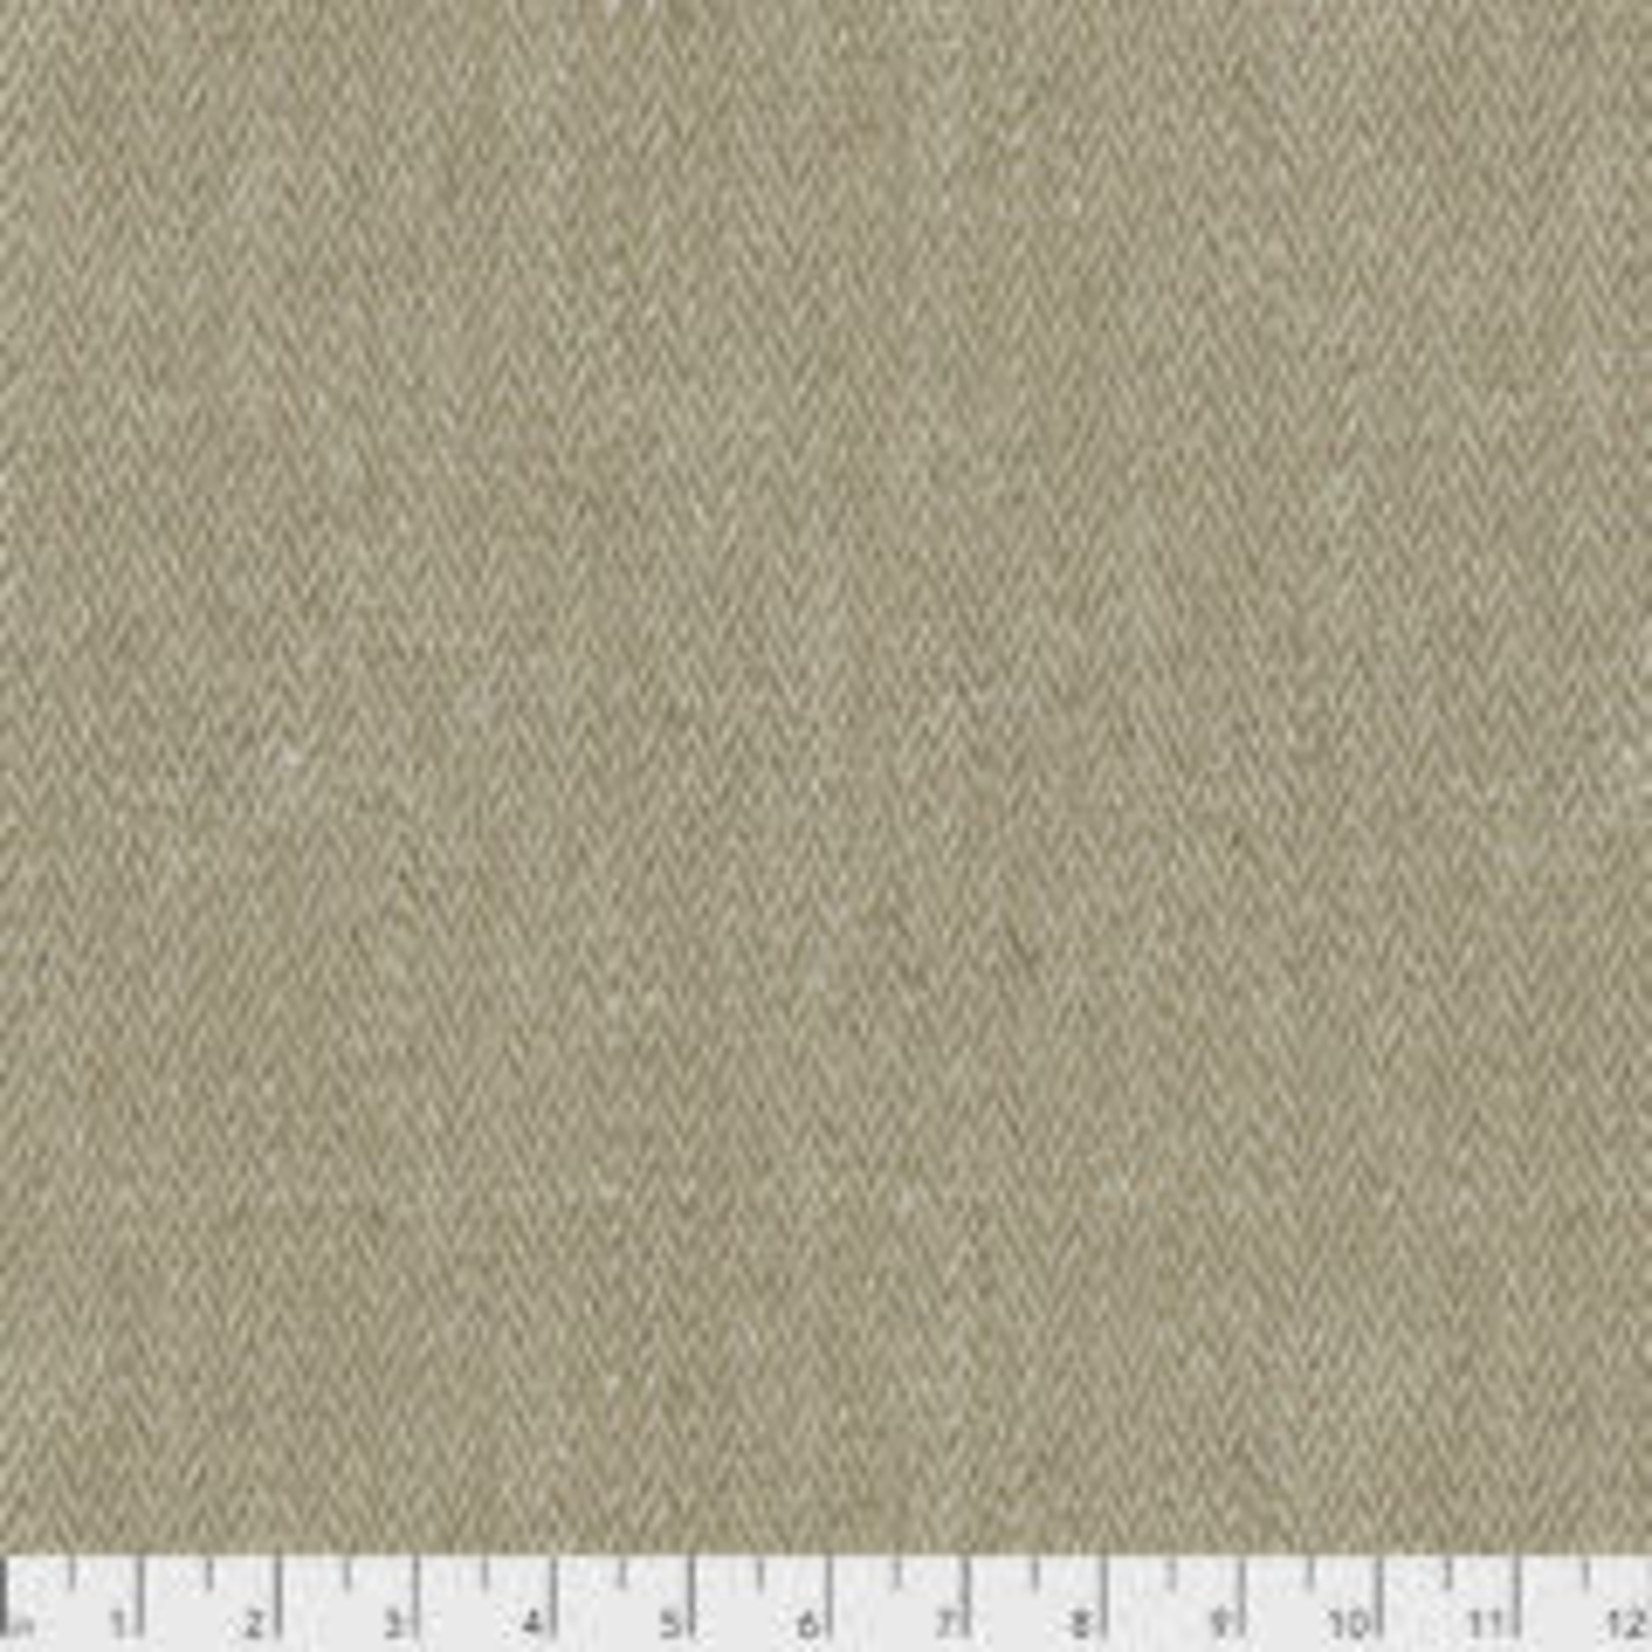 135cm MORRIS & Co. - Brunswick Weave, Fawn PER CM OR $16M